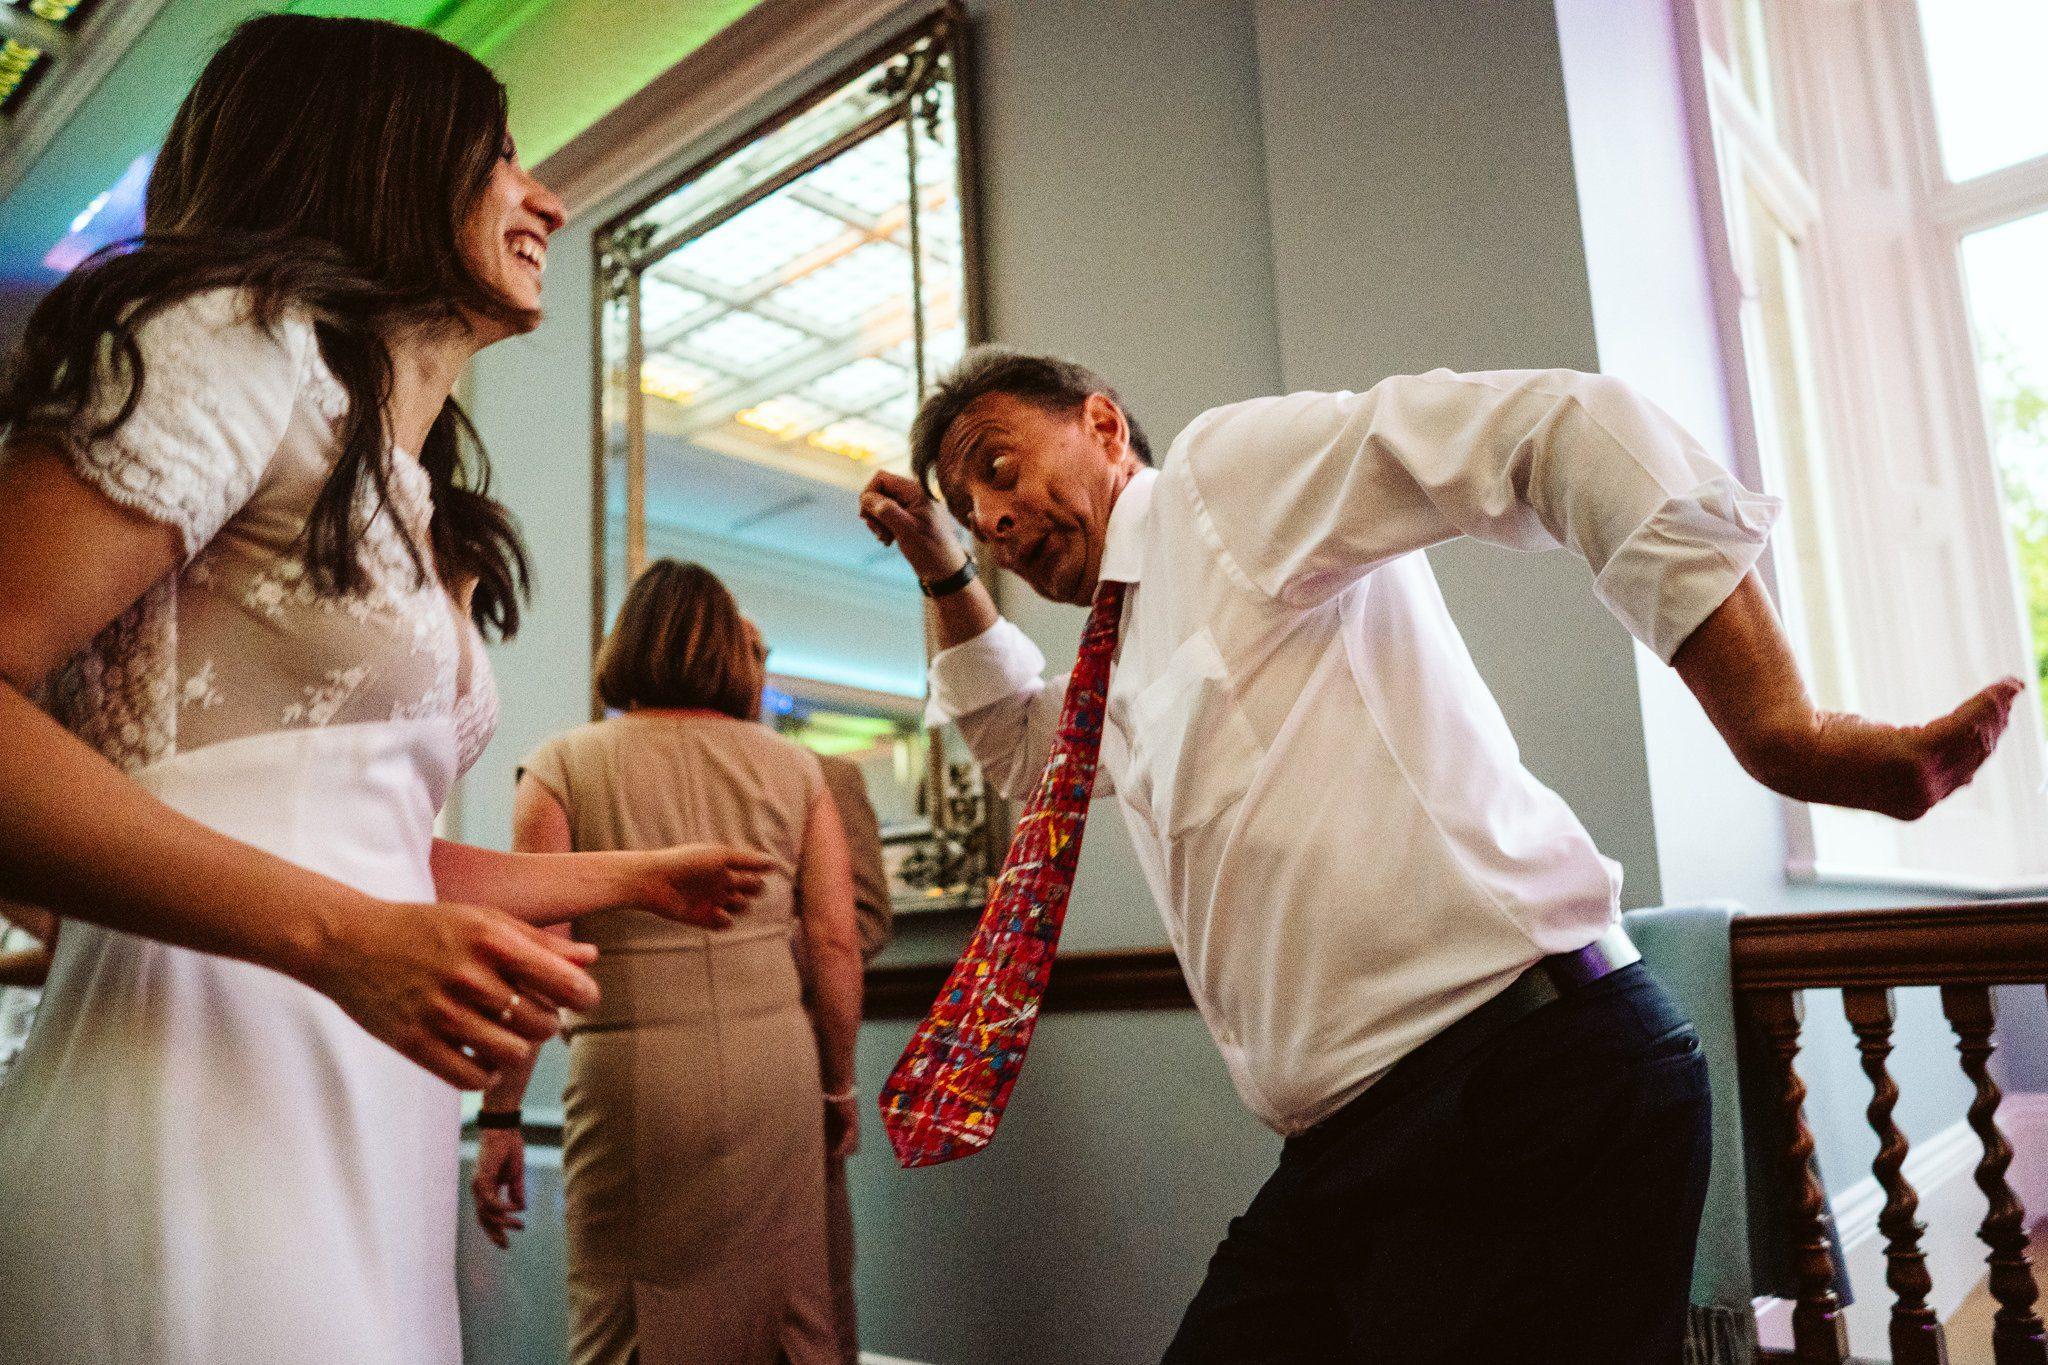 pendrall hall wedding reception